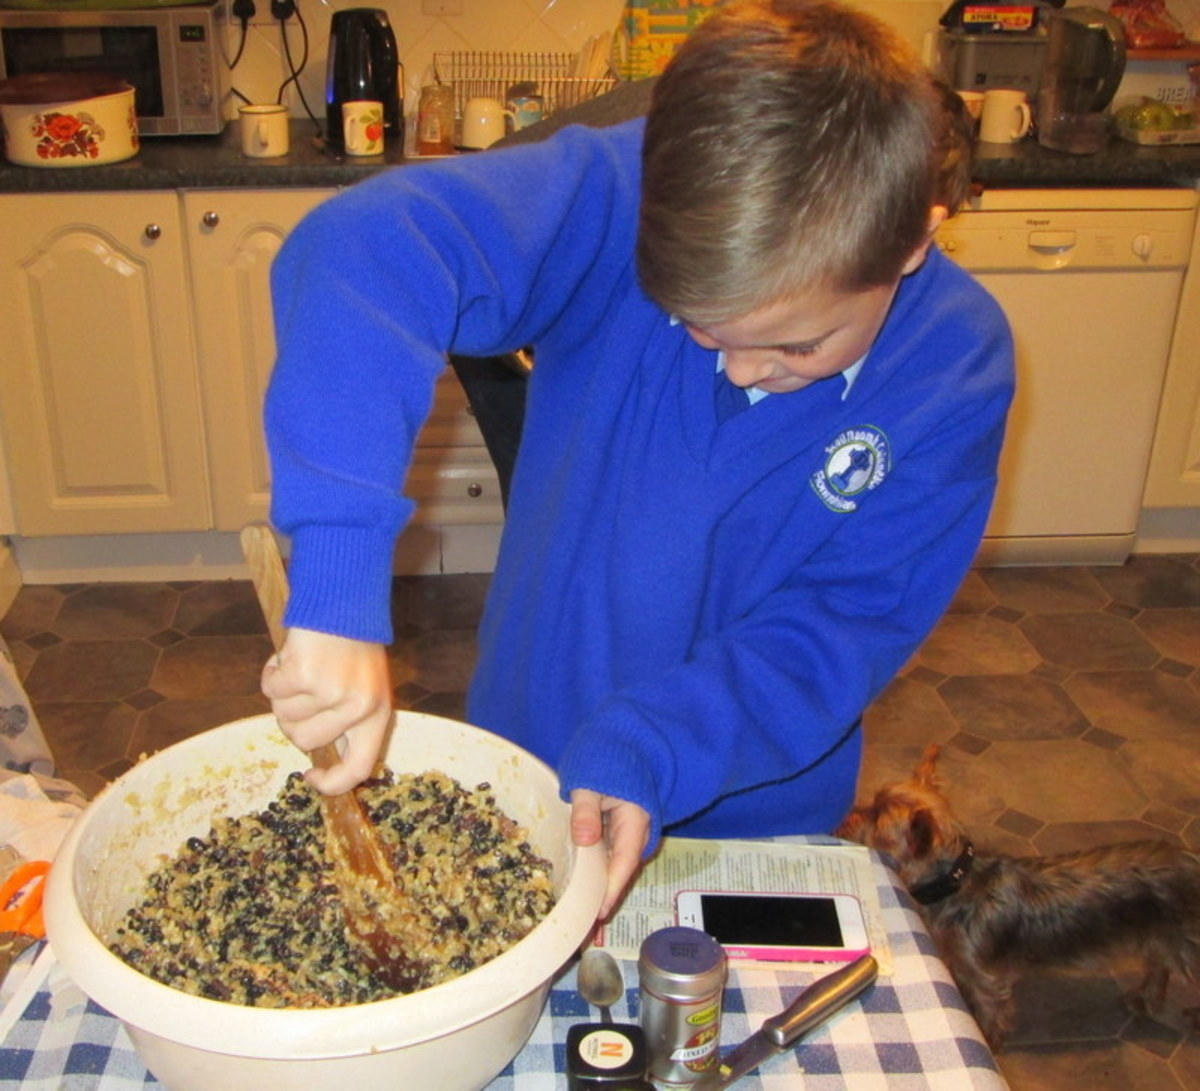 Stirring the Christmas plum pudding and making a wish - An Irish Christmas tradition